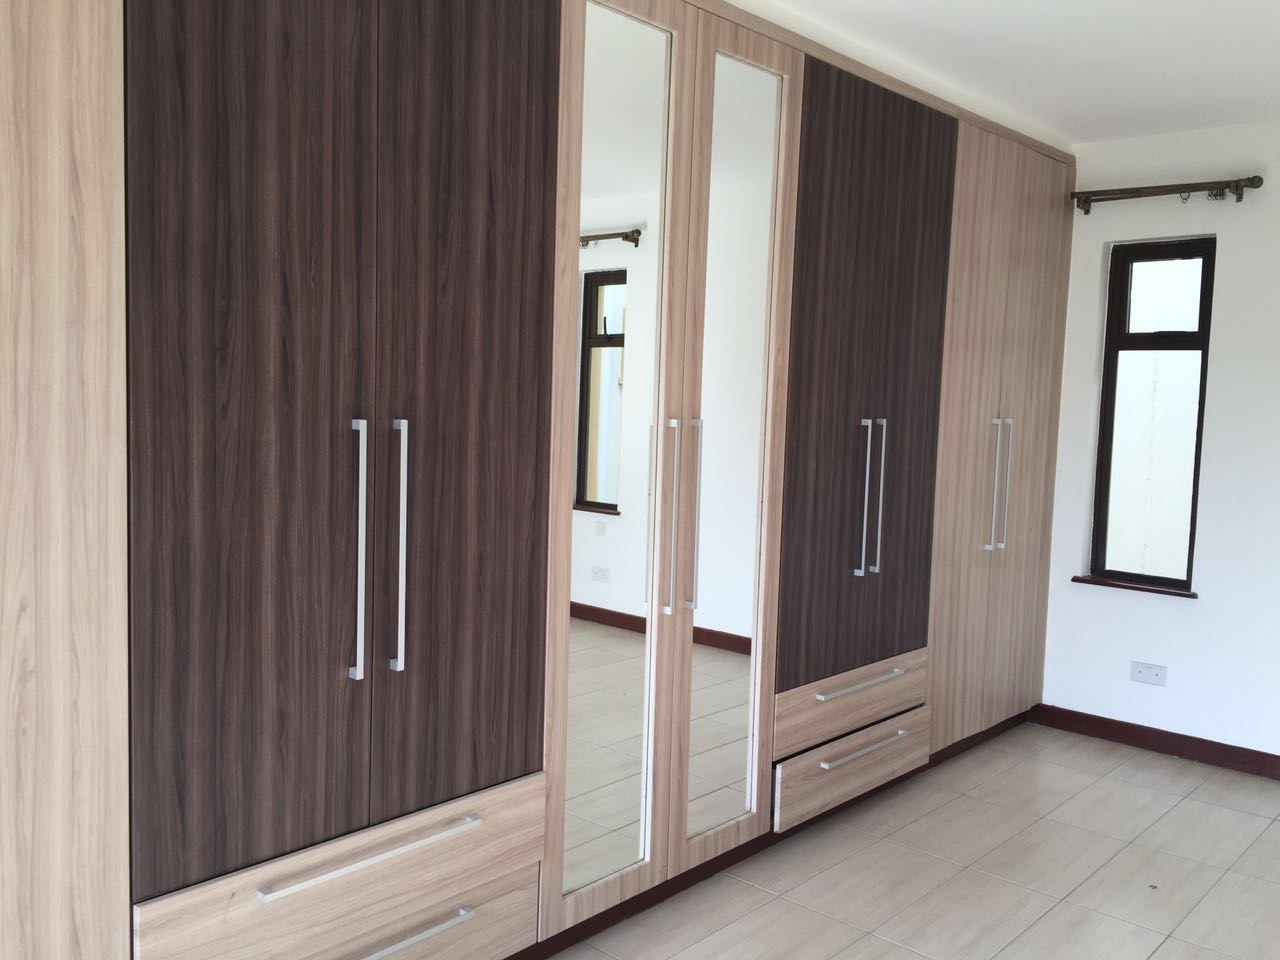 Dg properties ltd member of dawda group dg oasis south for Master bedroom cupboards